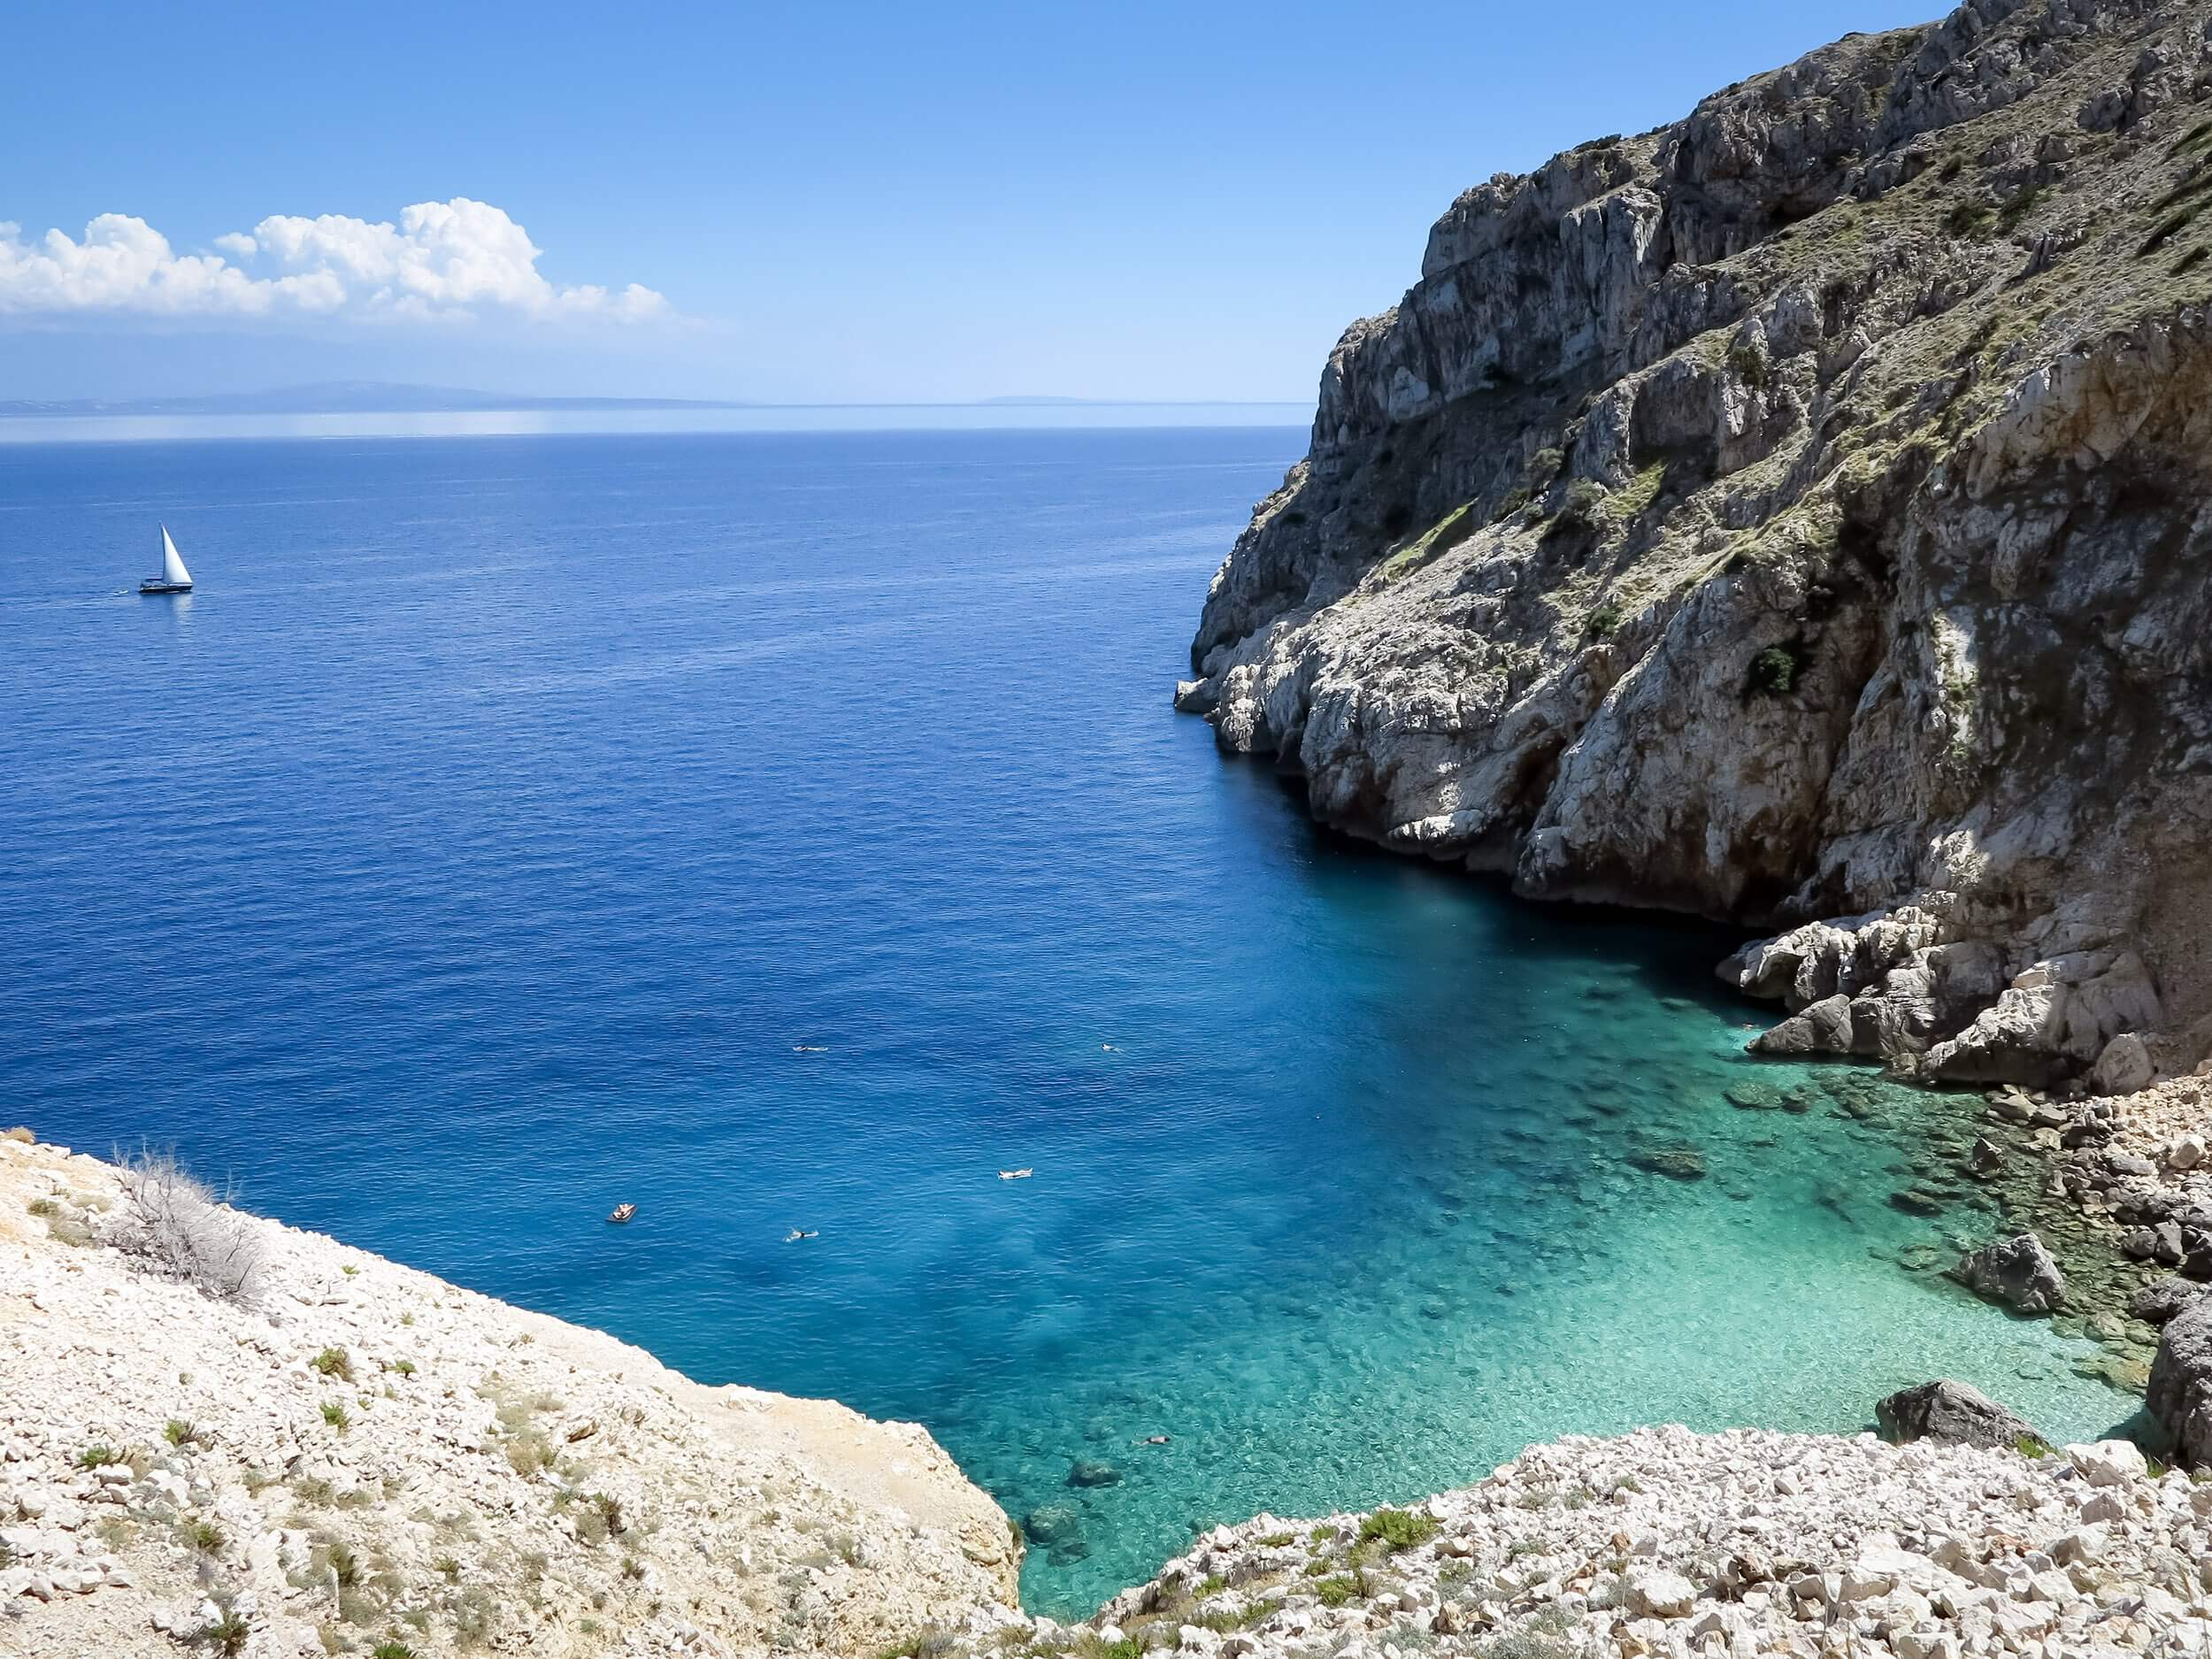 The unforgettable Mali Bok beach on Cres Island, Croatia.